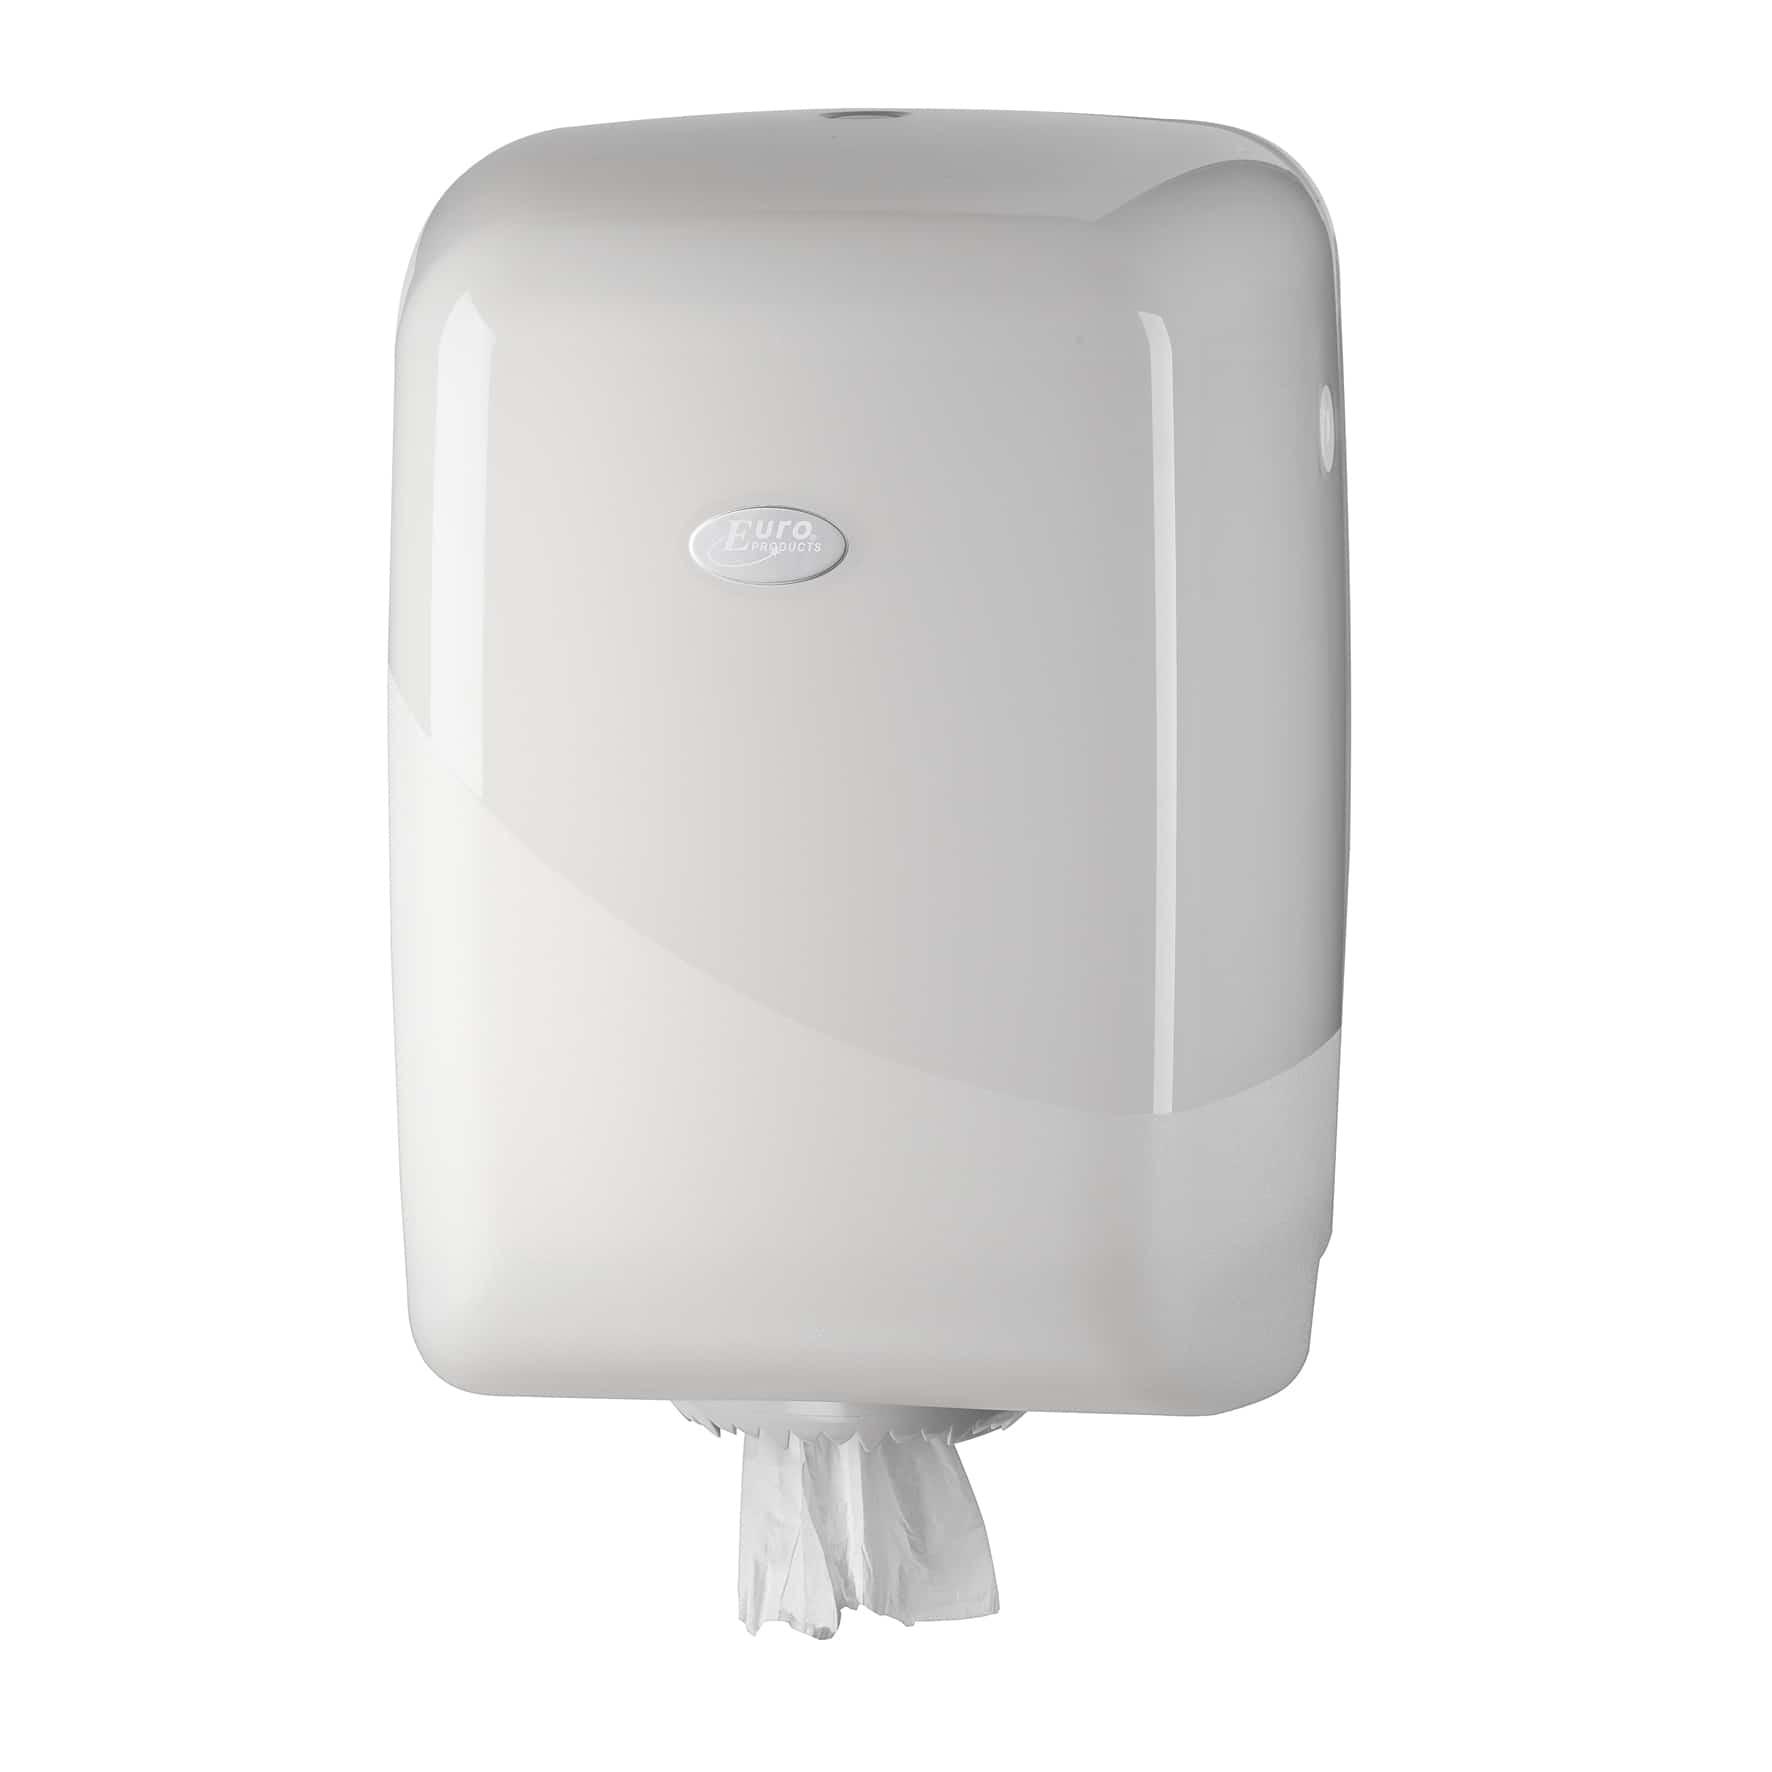 Pearl White Midi dispenser